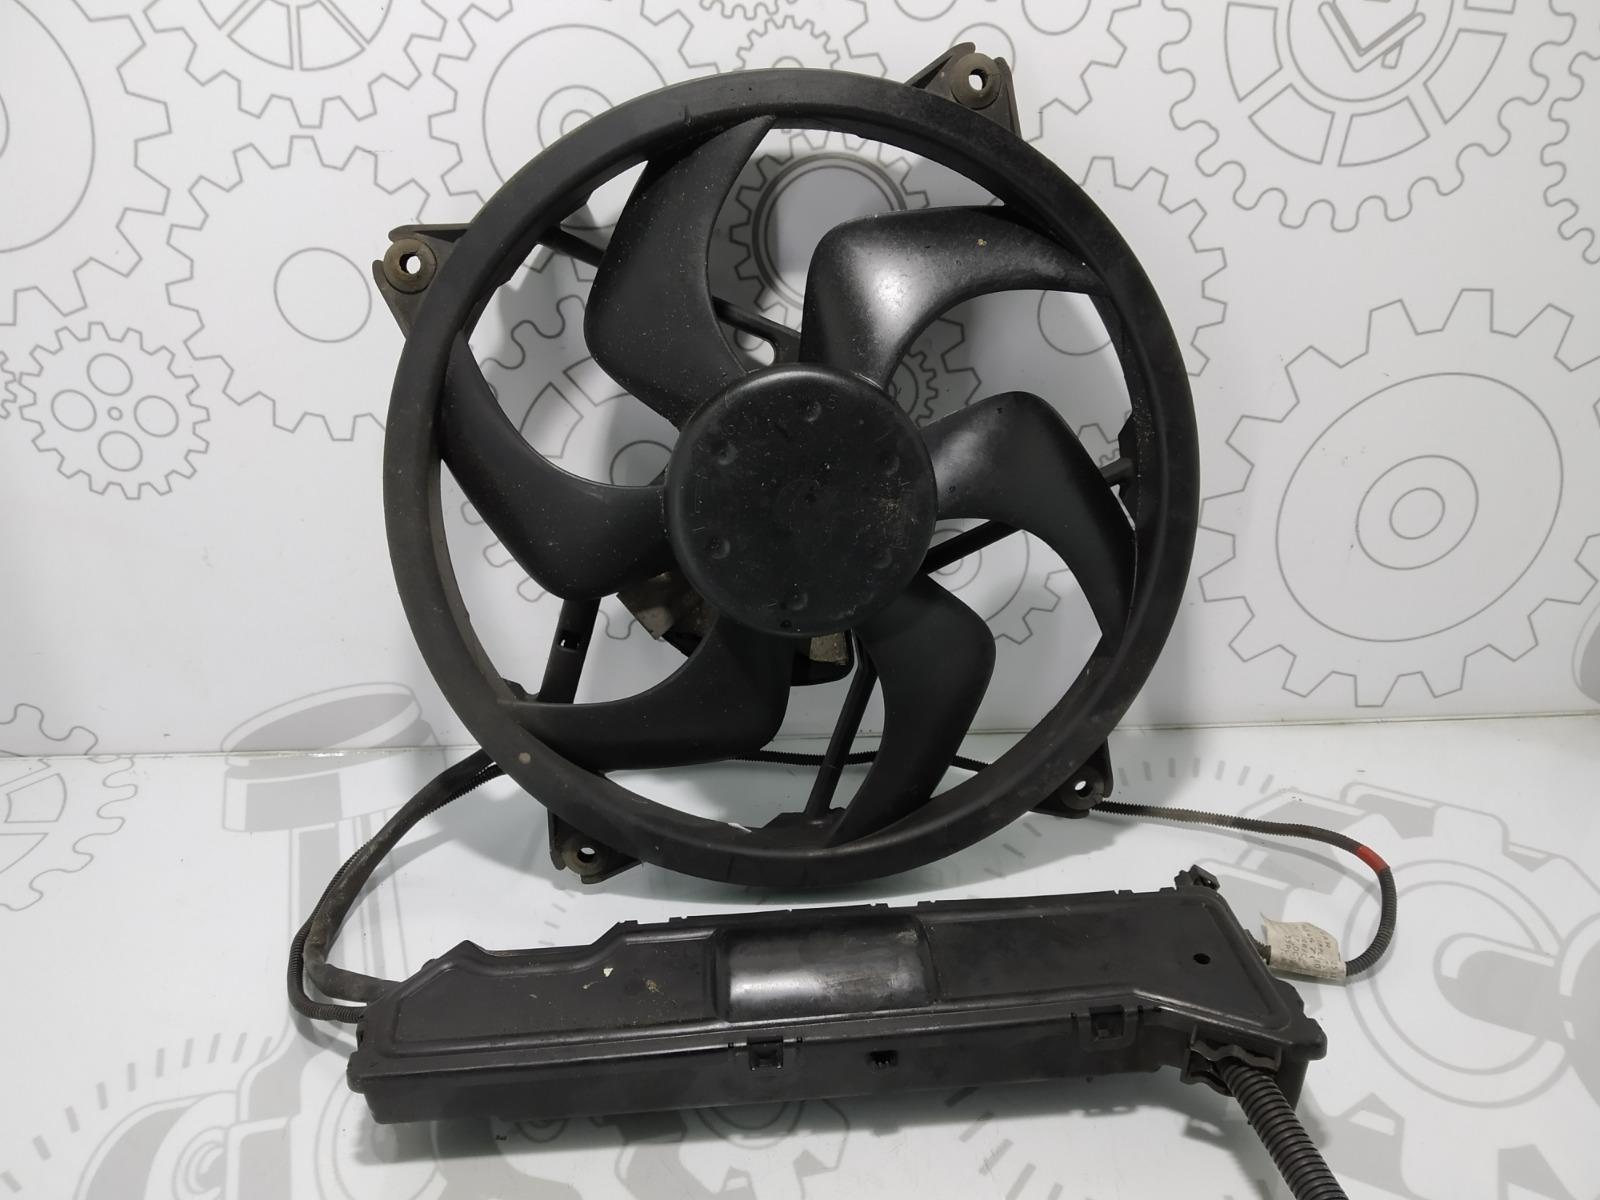 Вентилятор радиатора Peugeot 407 2.0 HDI 2007 (б/у)